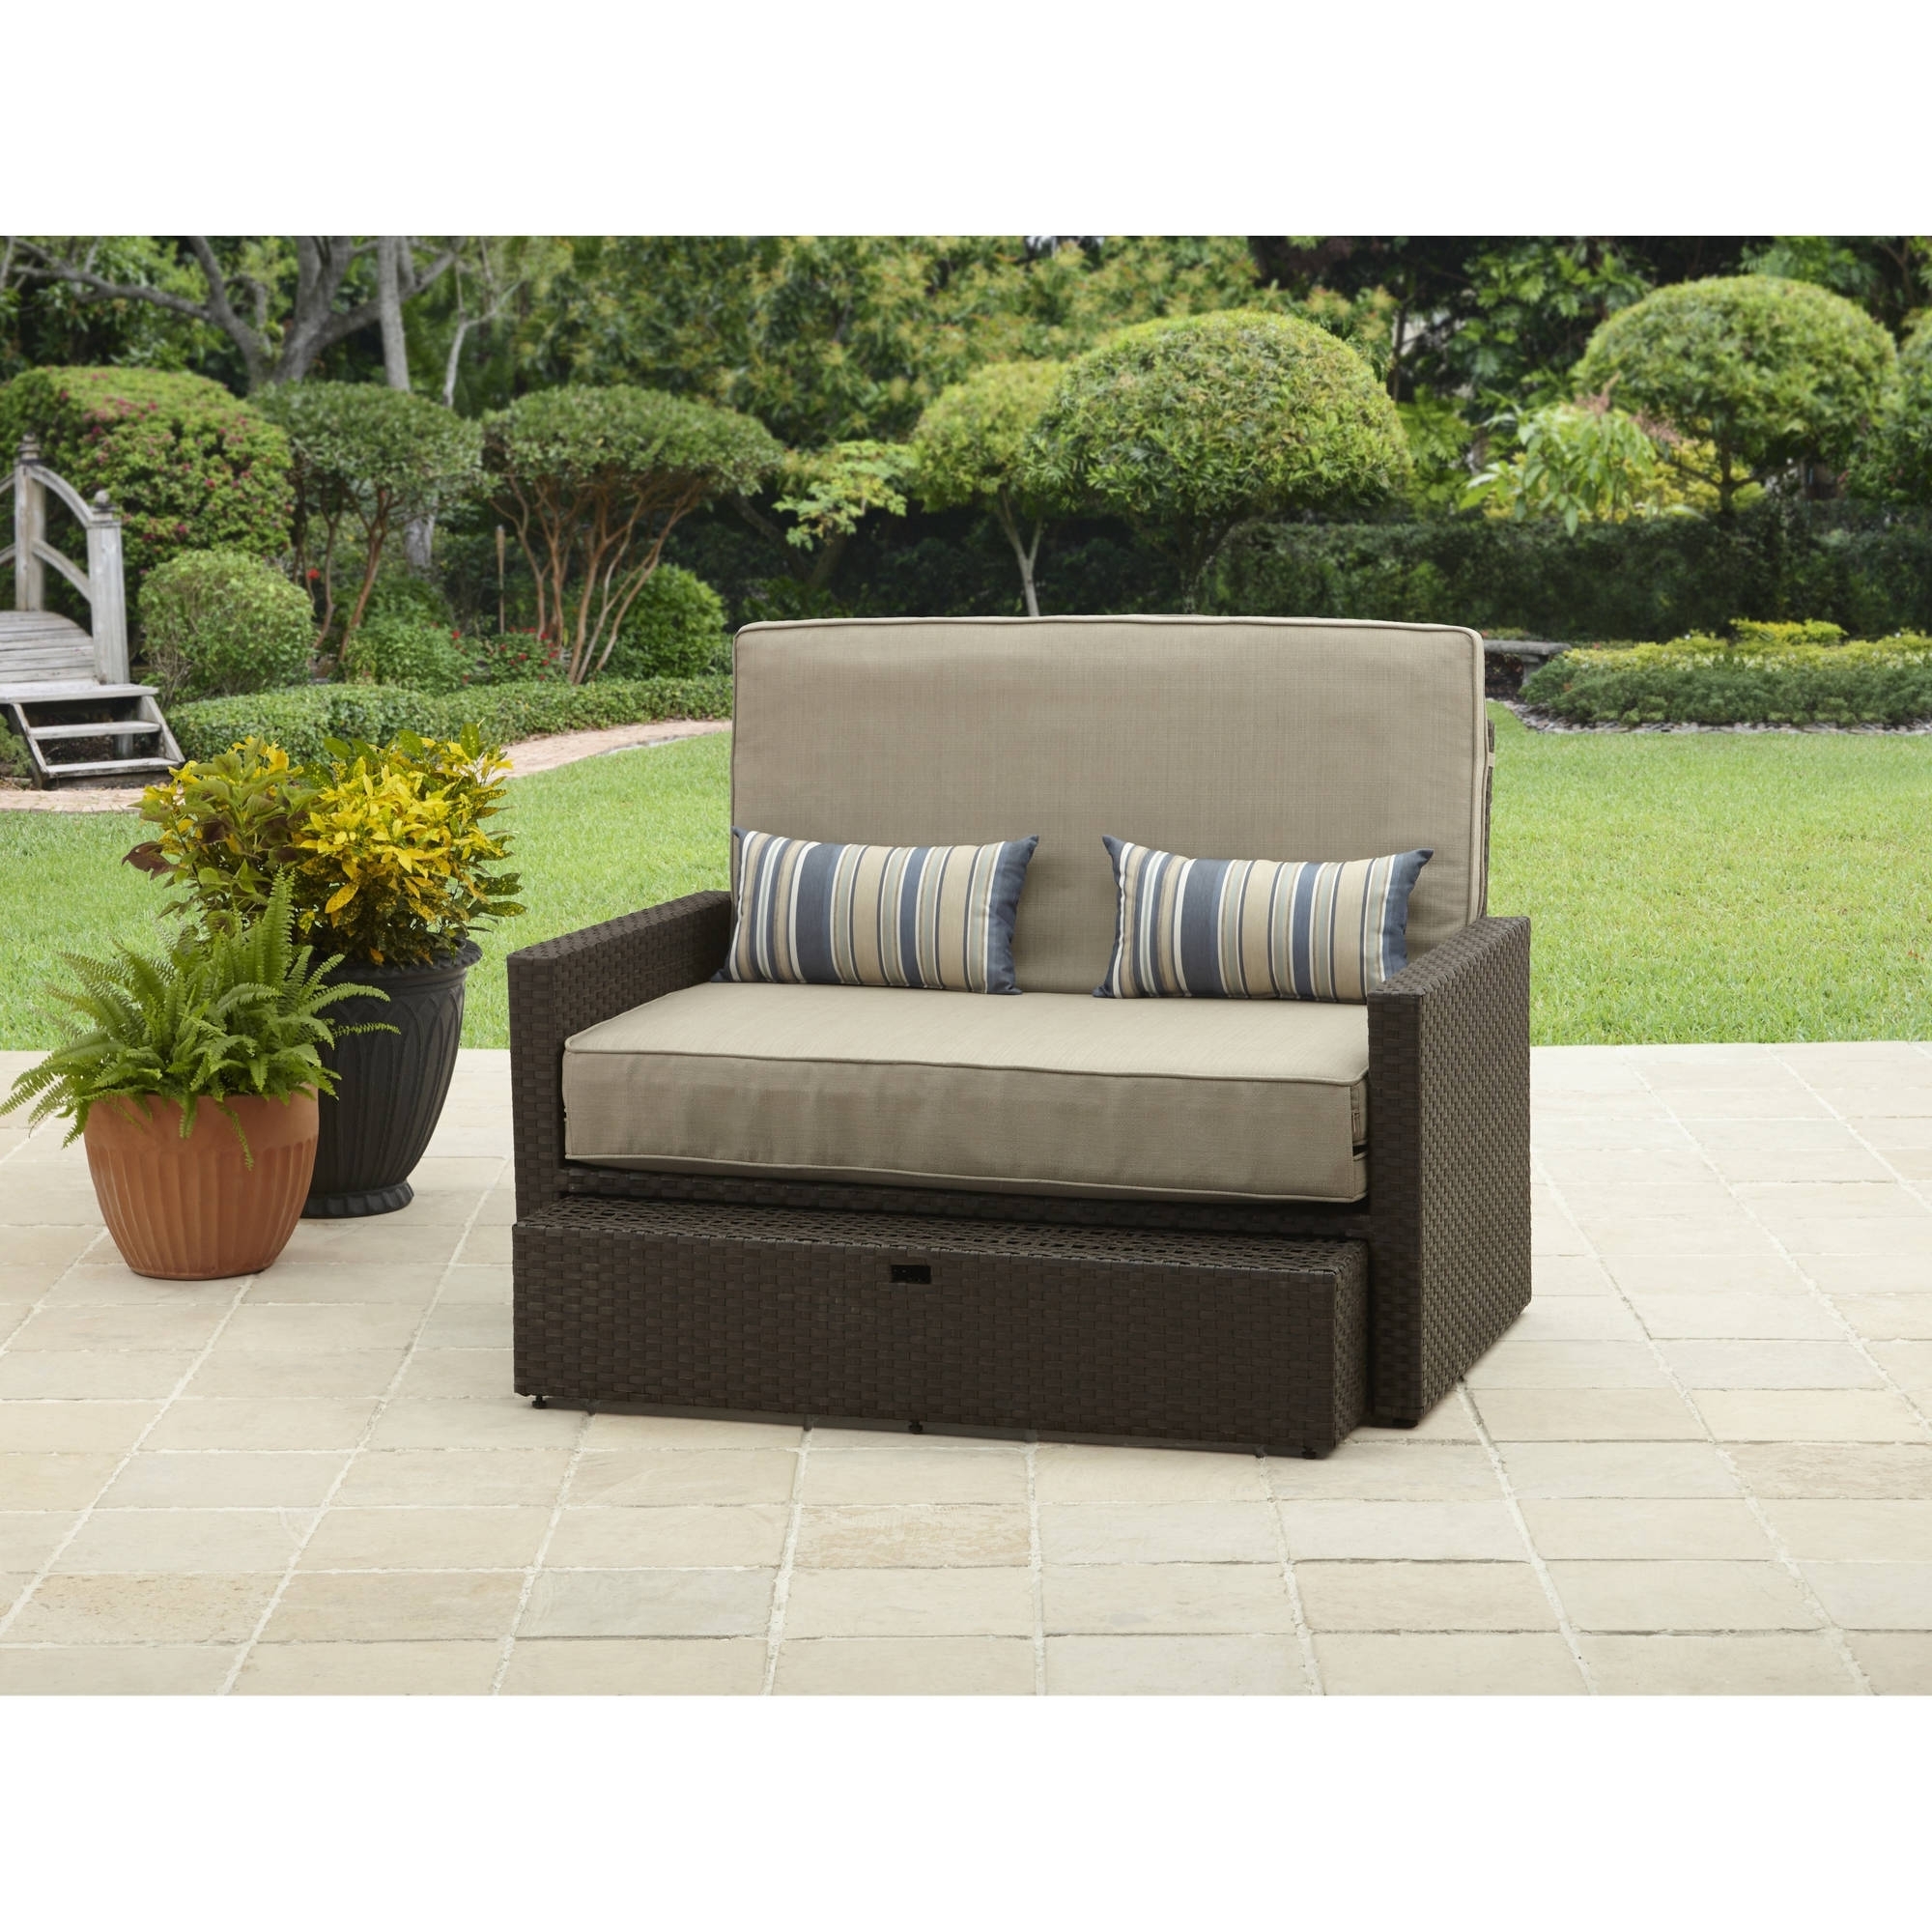 Popular Loveseat Chaises Intended For Better Homes And Gardens Avila Beach Loveseat/chaise – Walmart (View 12 of 15)